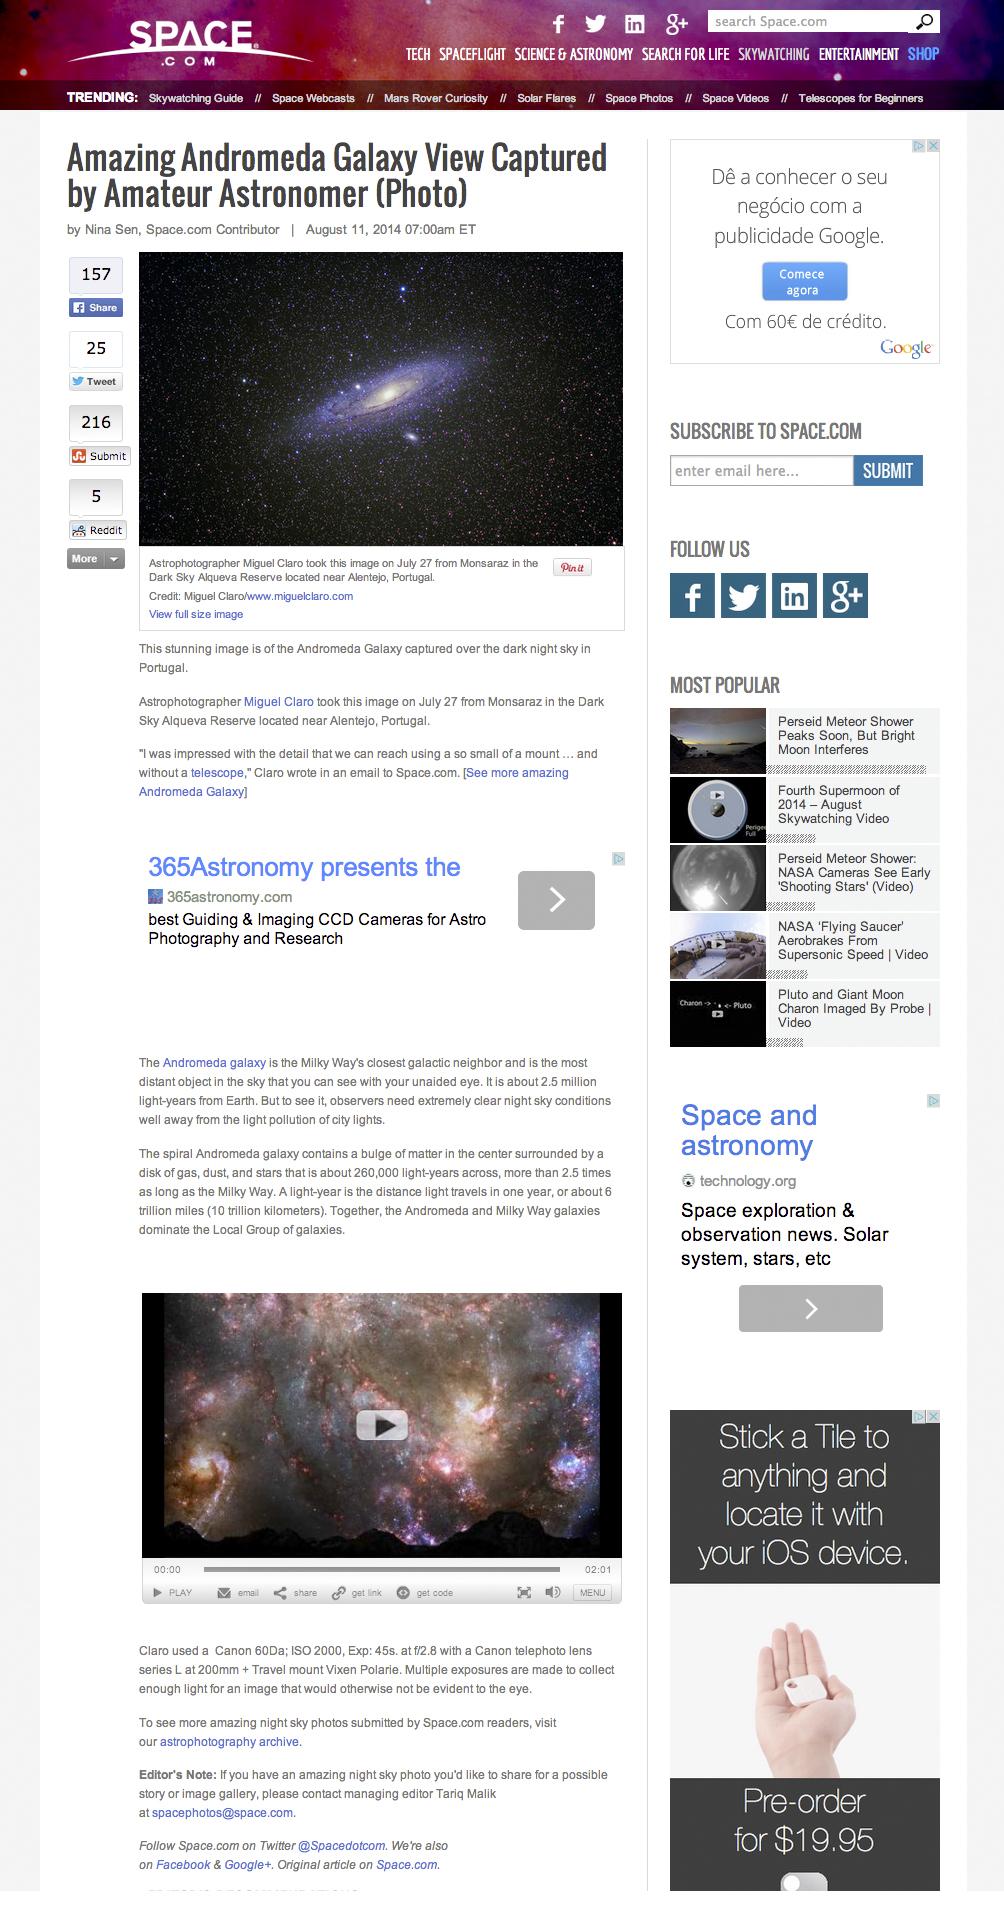 SpaceCom-11-08-2014